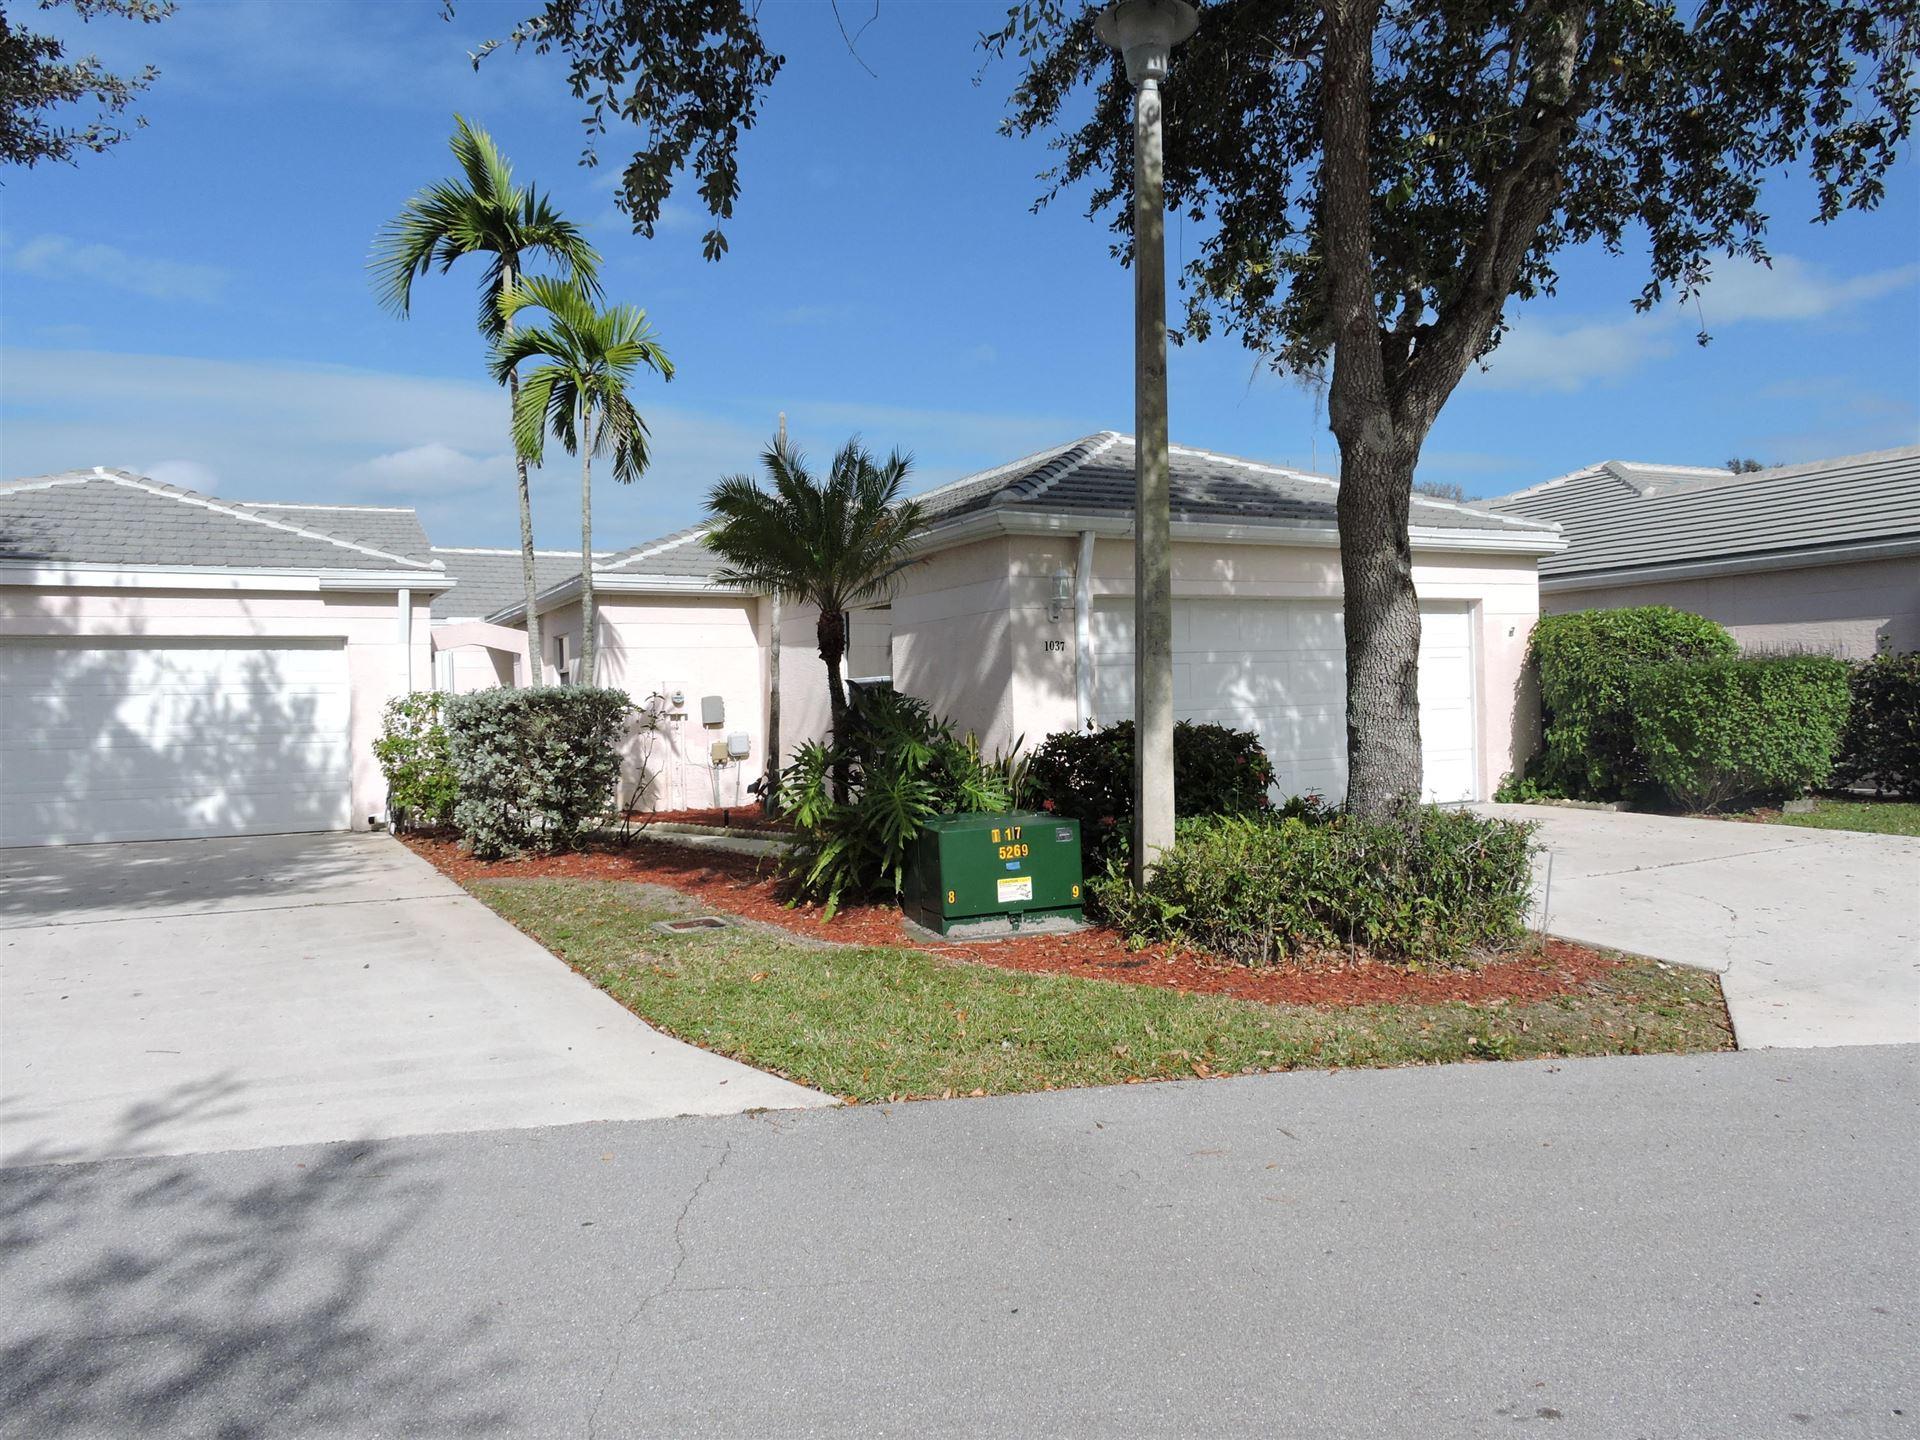 Photo of 1037 Island Manor Drive Drive, Greenacres, FL 33413 (MLS # RX-10681601)